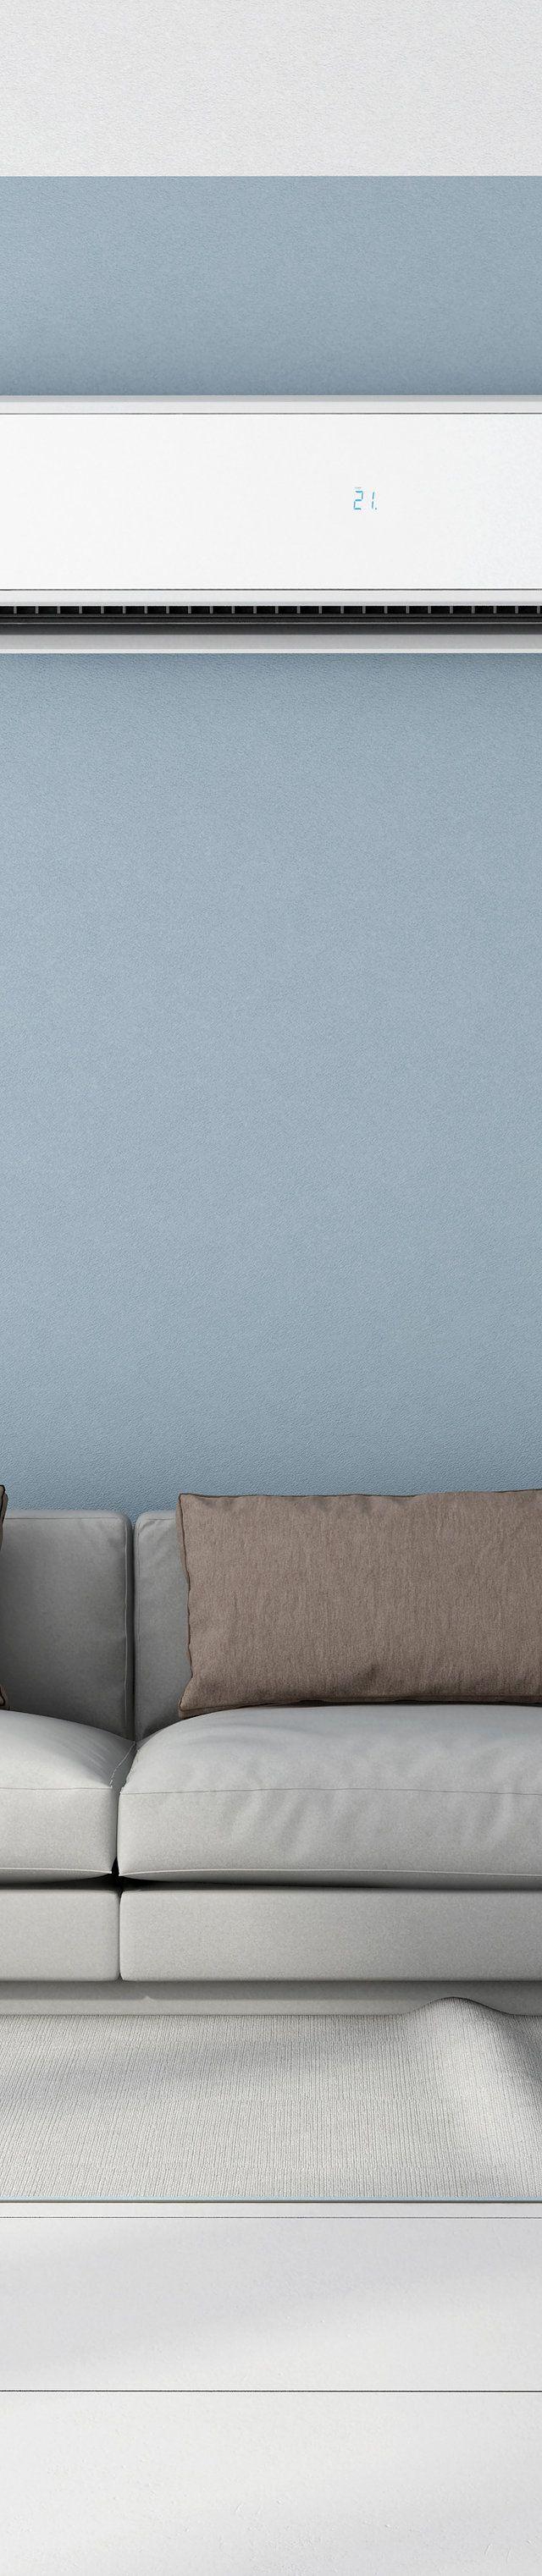 Whole House EMF Protection | United States | The Lemurian Plug | CSS